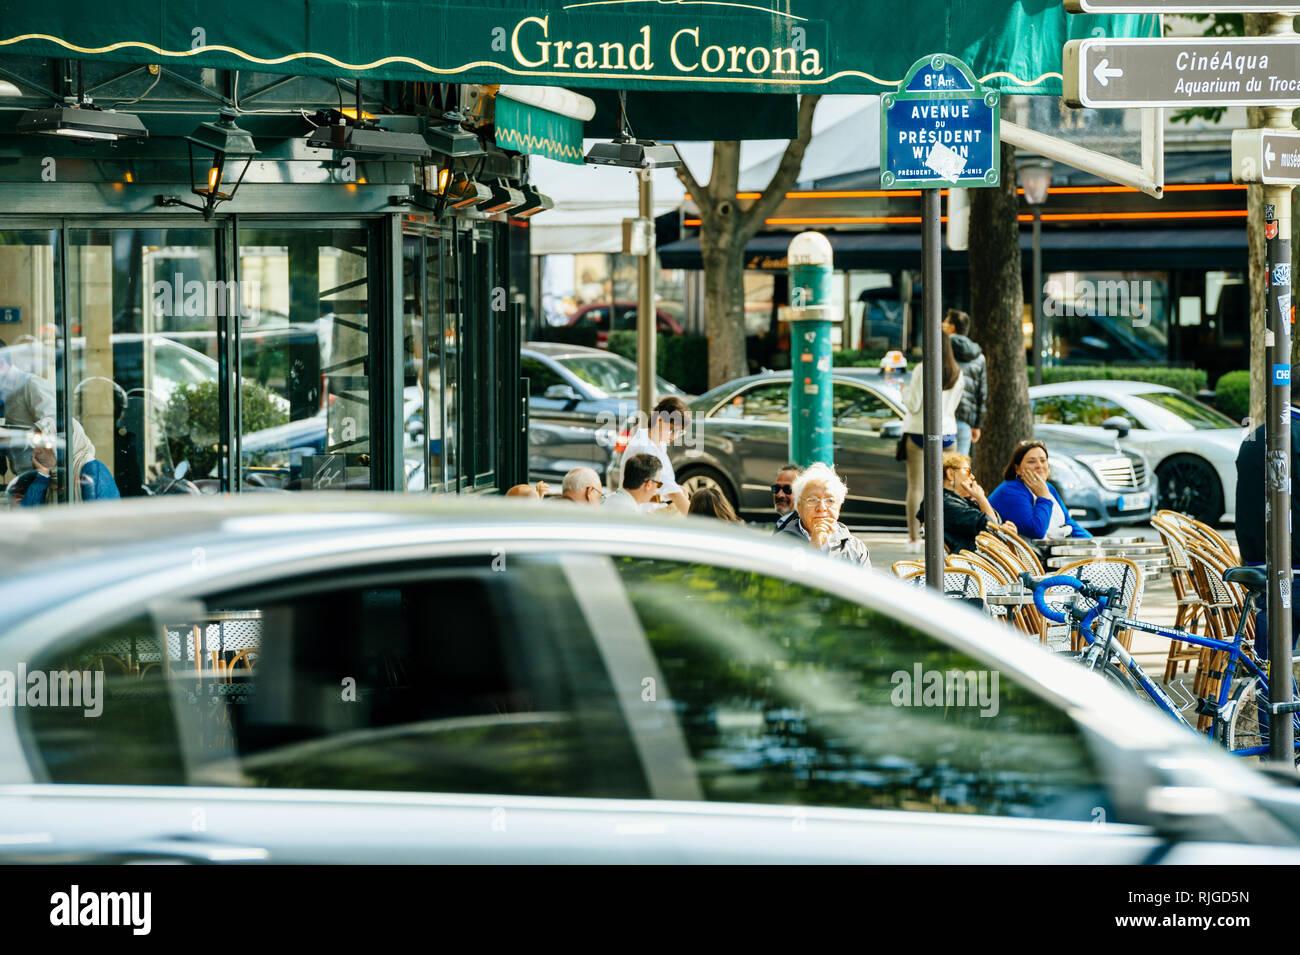 PARIS, FRANCE - MAY 21, 2016: Senior man enjoying cafe and breakfast at Grand Corona Restaurant Paris on a bright morning day - Stock Image